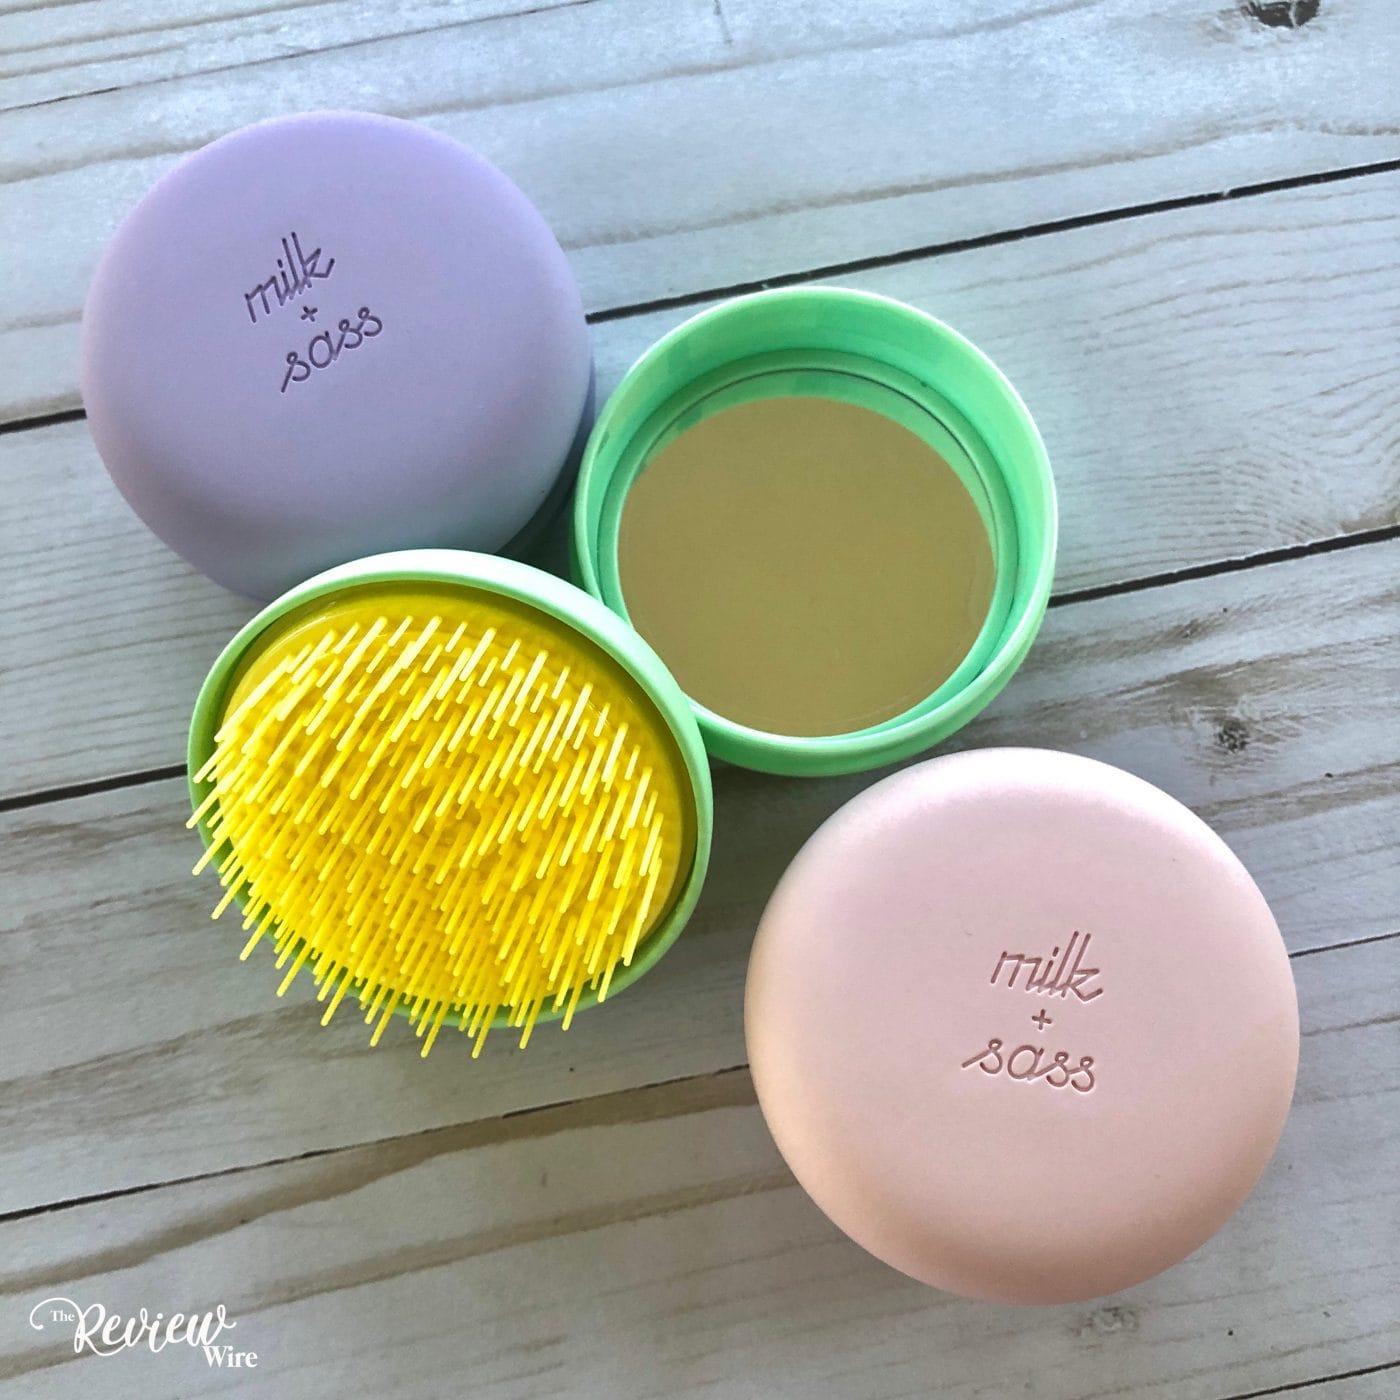 Milk & Sass Macaron Hair Brush